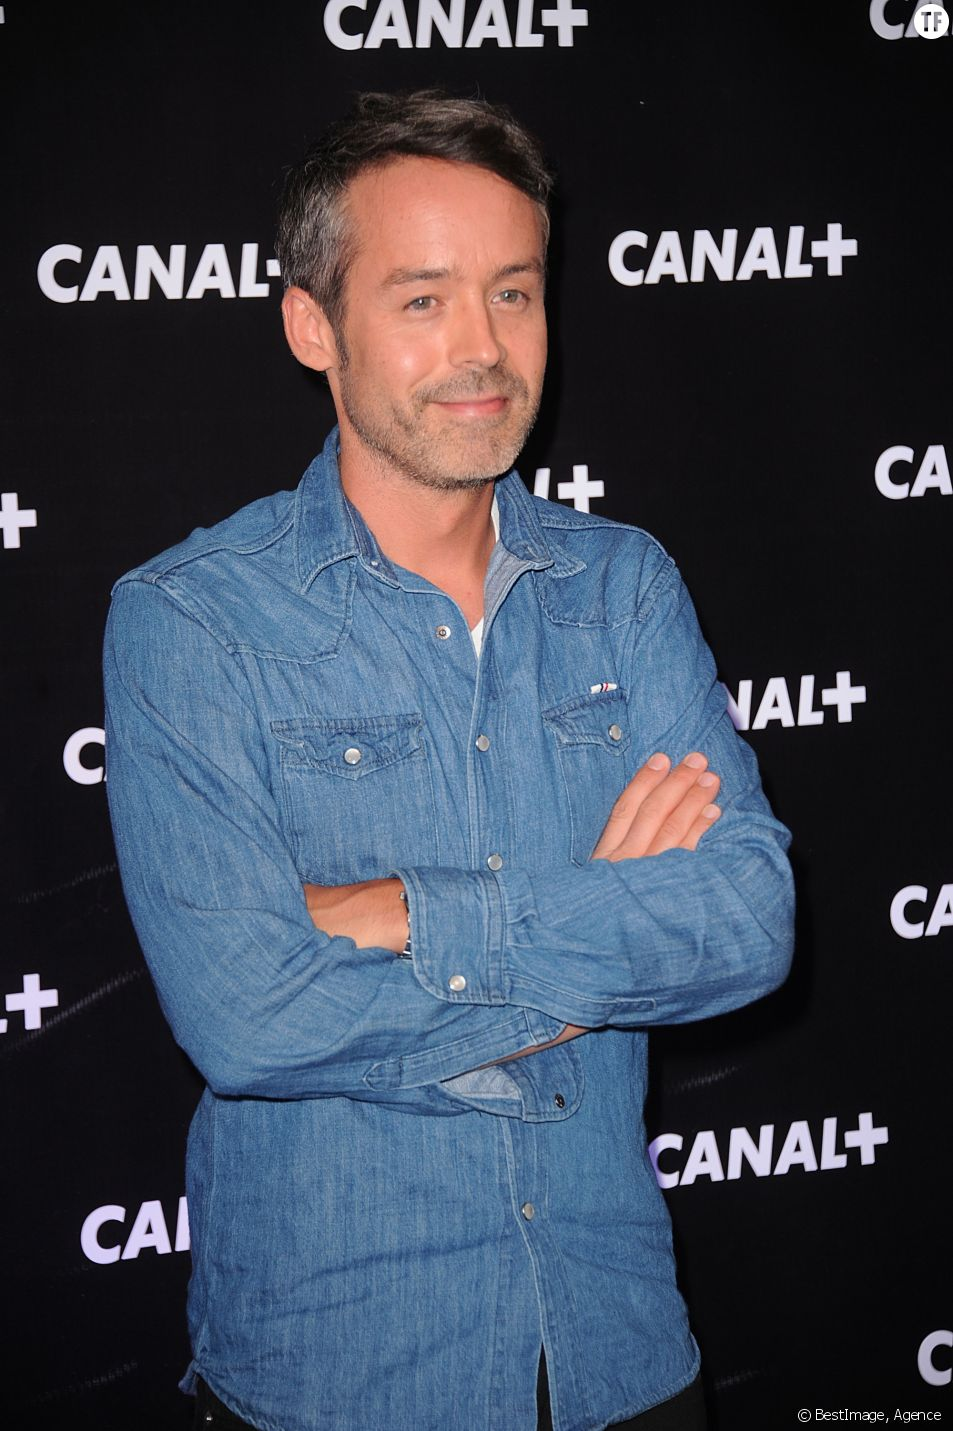 L'animateur Yann Barthès